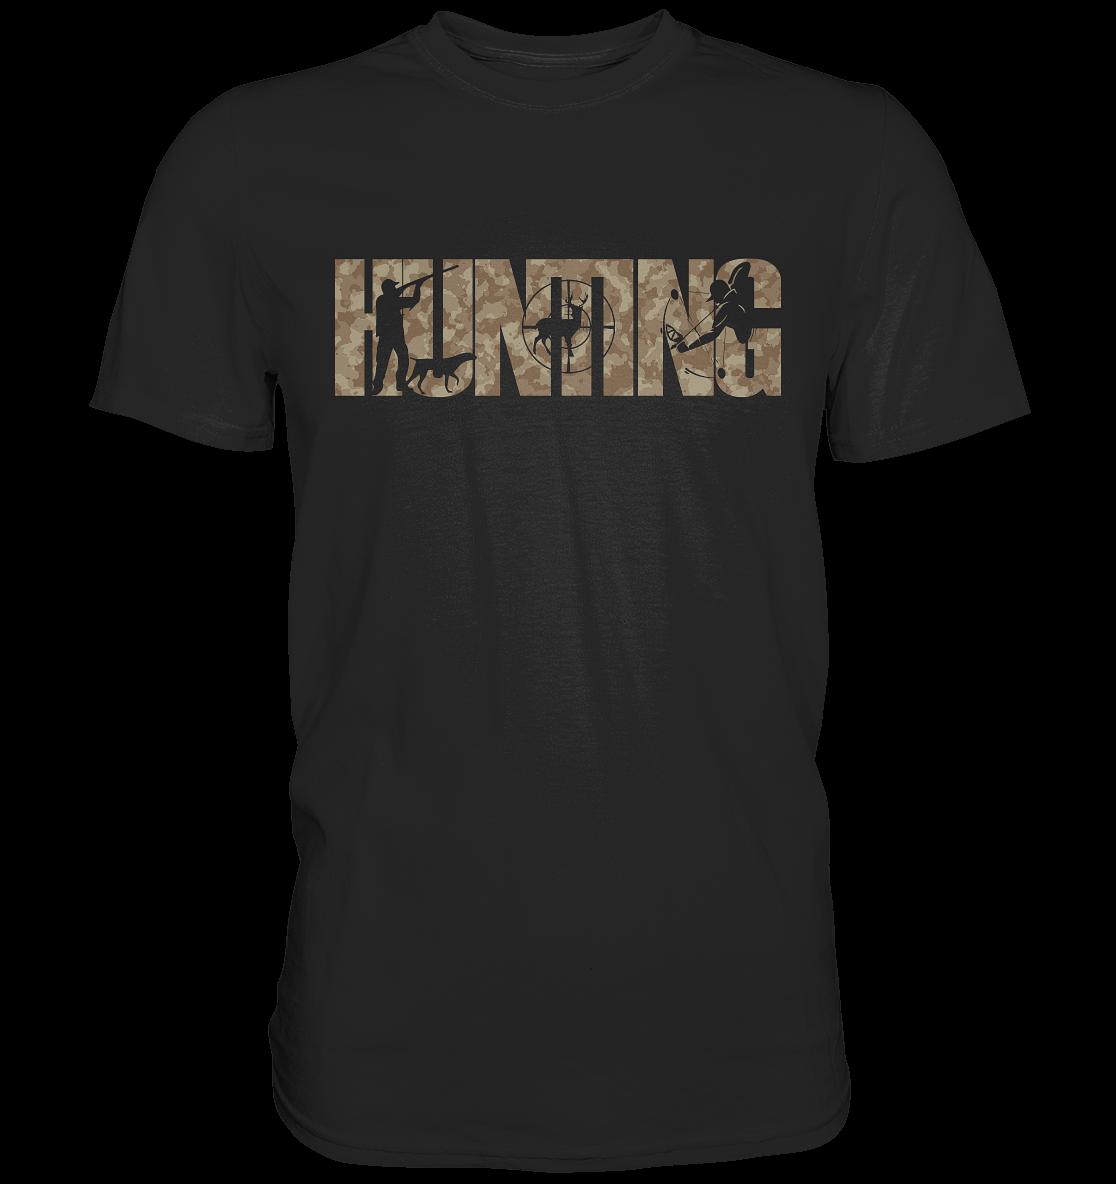 t-shirt_hunting_jagen_camo_sand_schwarz